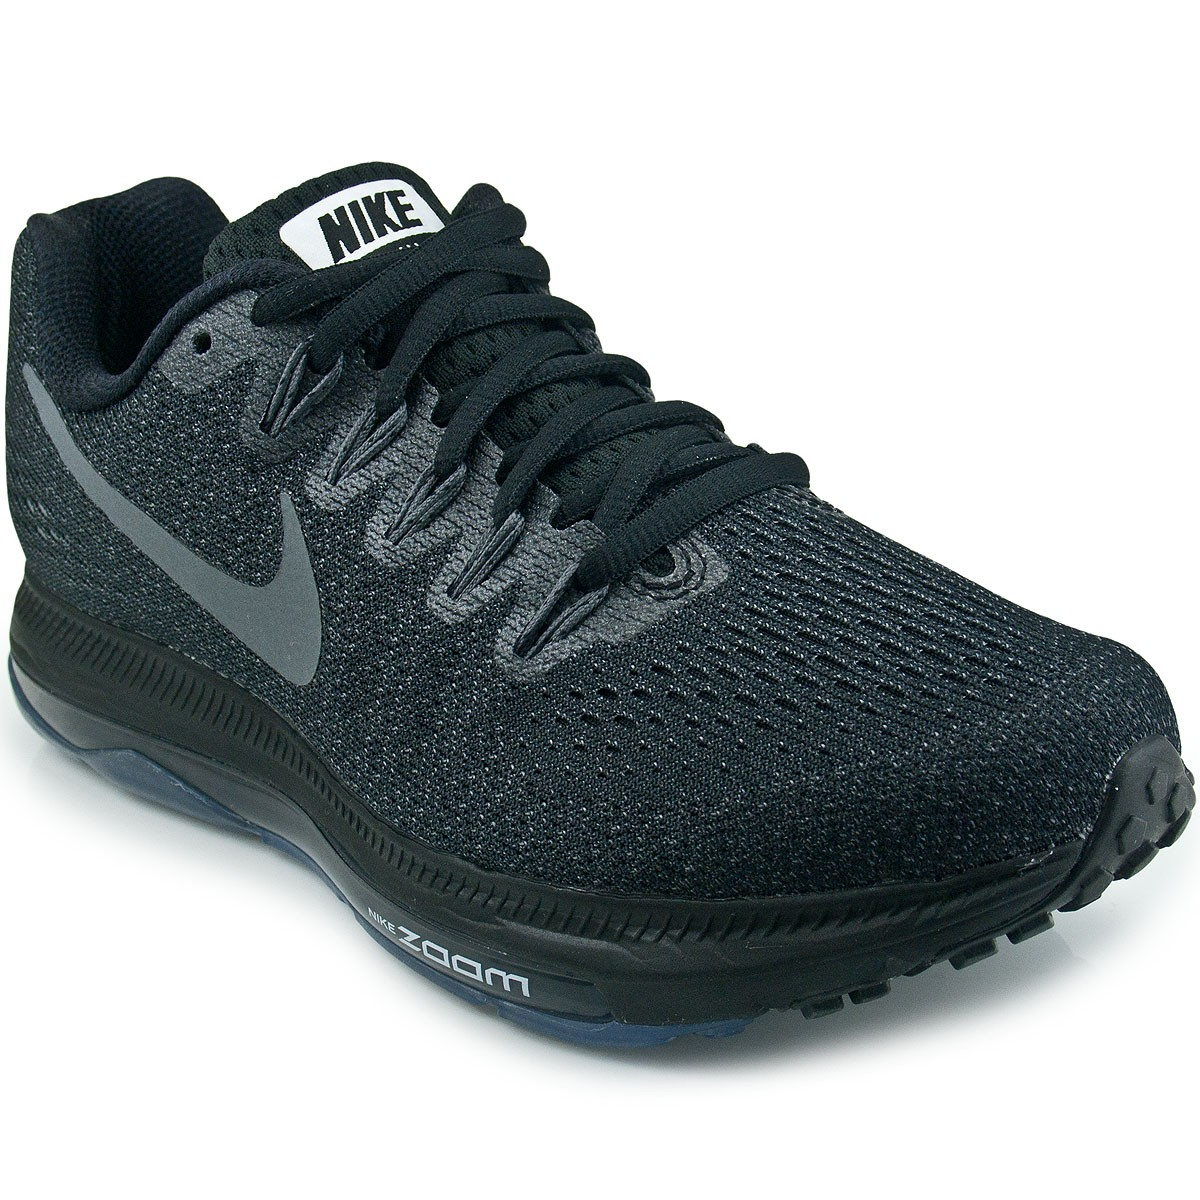 5efeec5d40b Tênis Nike Zoom All Out Low W 878671